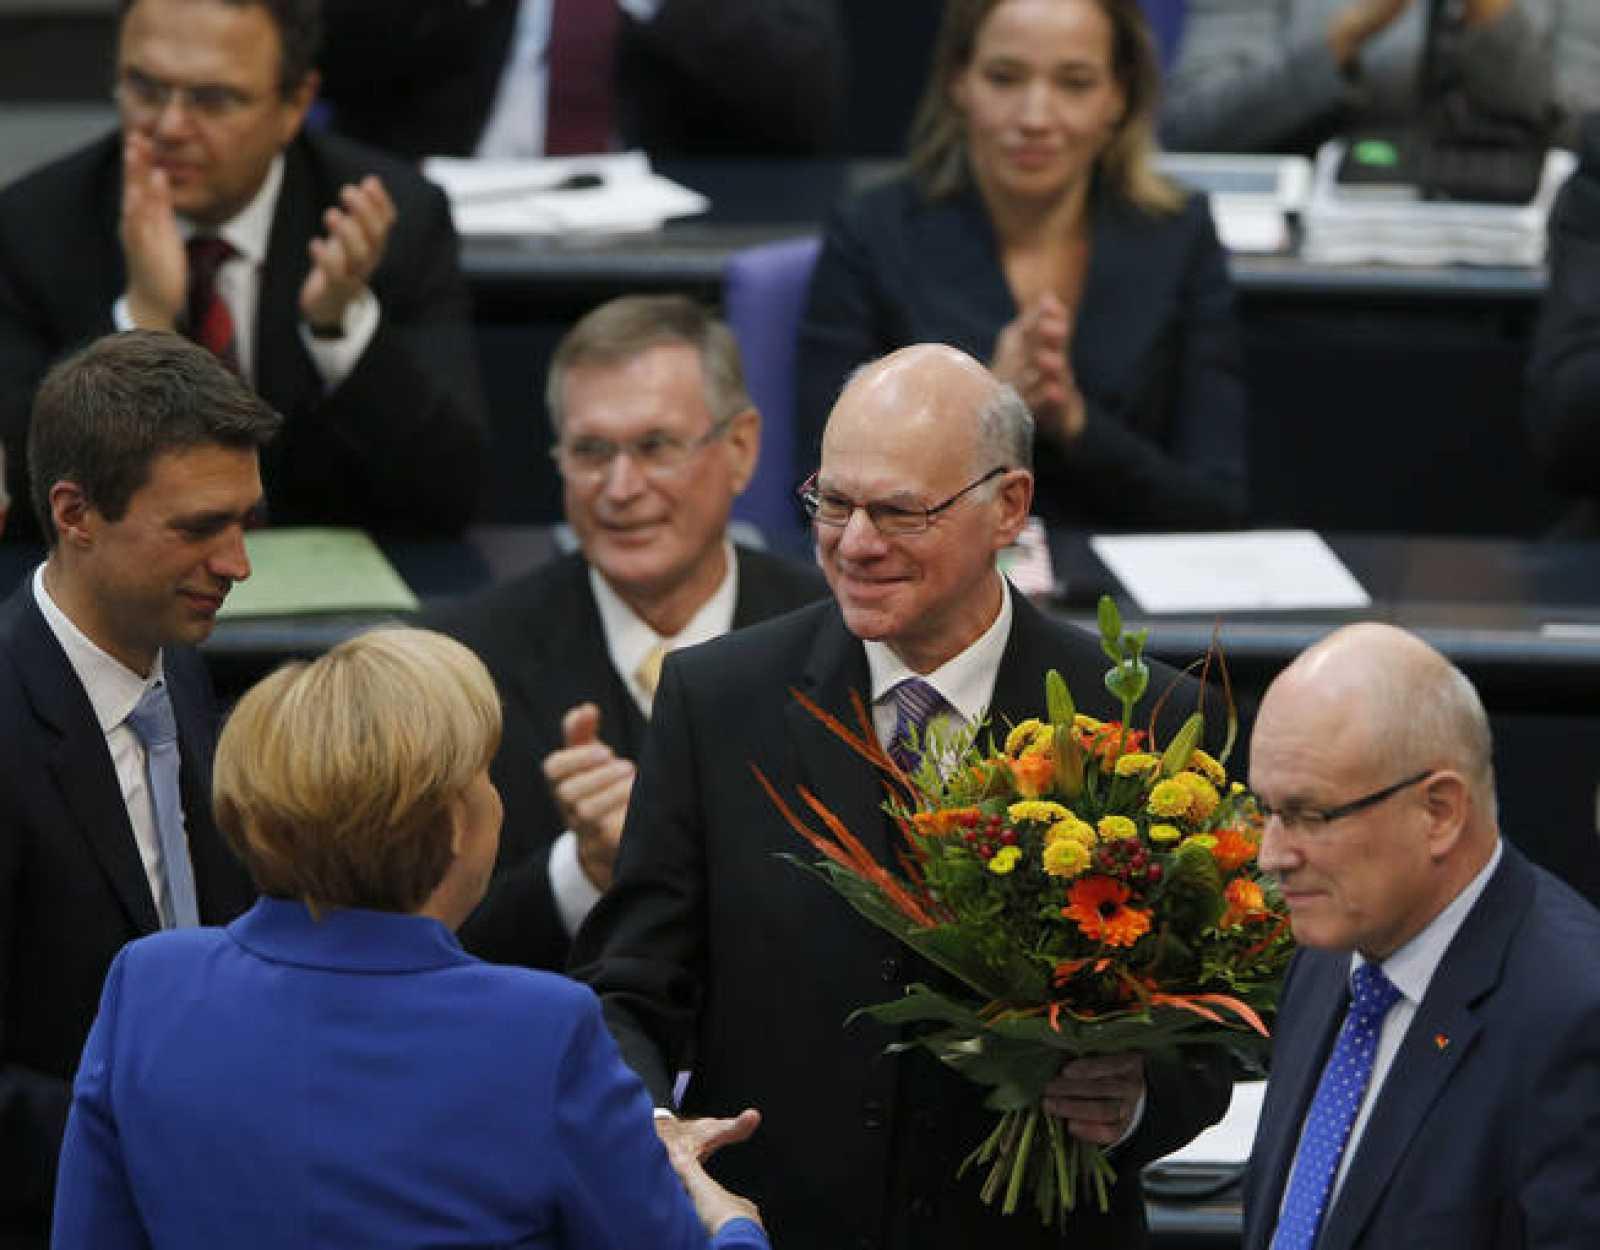 Angela Merkel felicita a Norbert Lammert, reelegido presidente del Parlamento alemán (Bundestag)